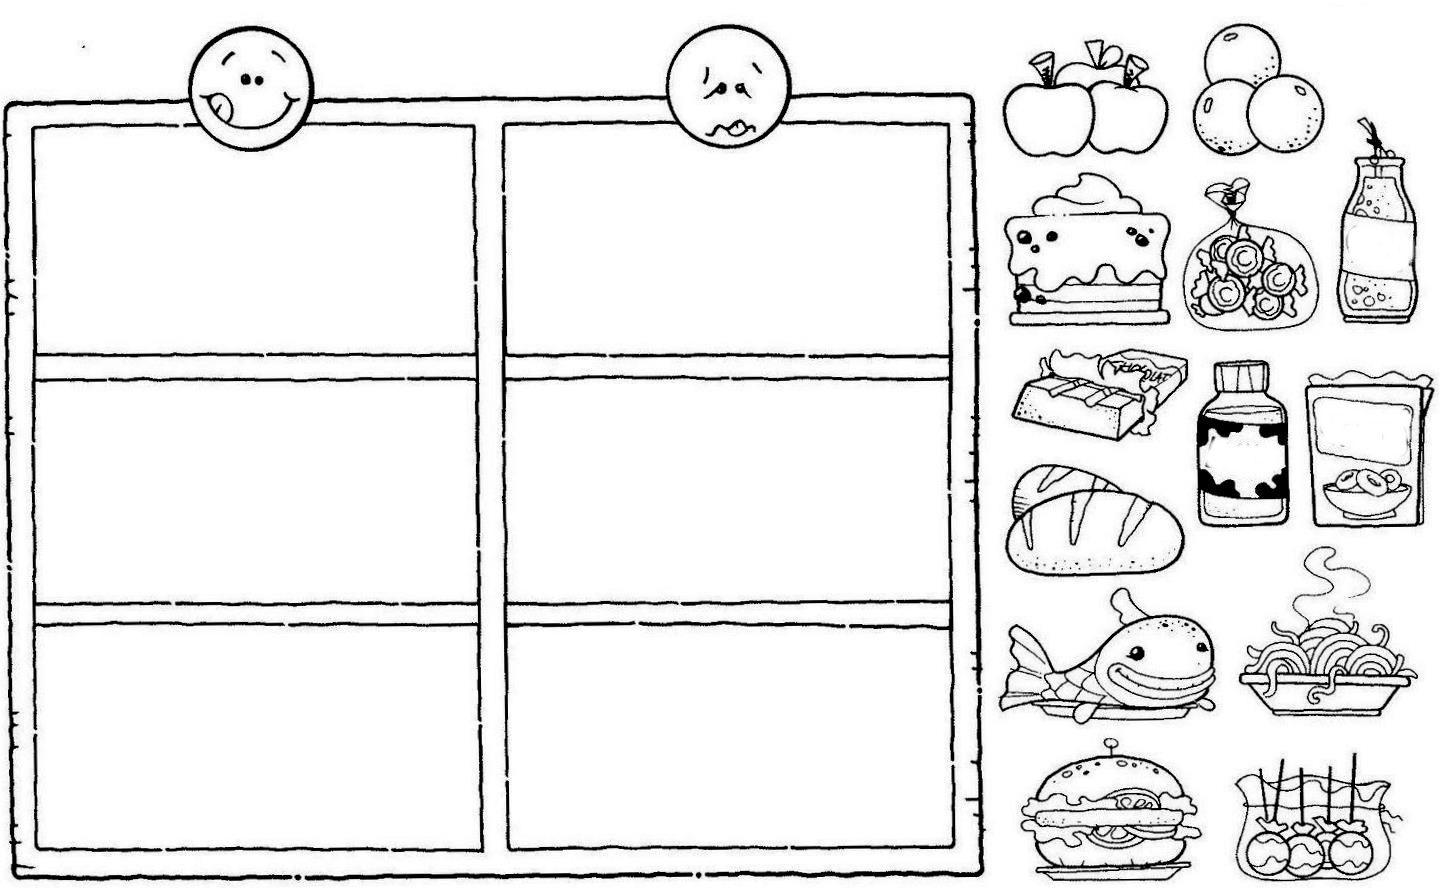 pirâmide alimentar para colorir - Pesquisa Google | Ciências ...